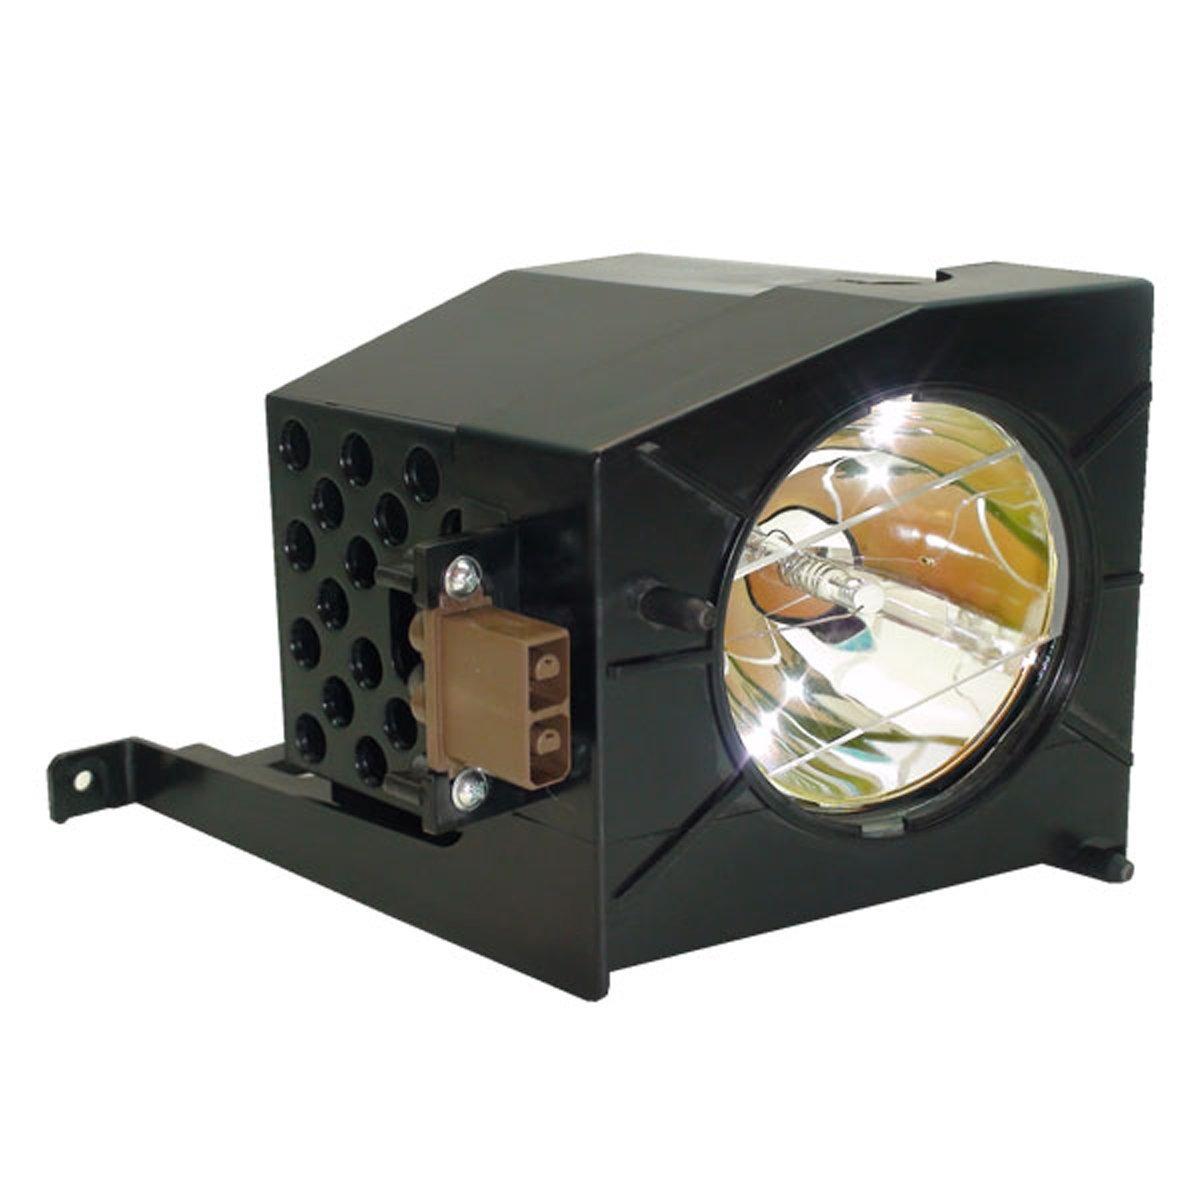 Lmpara De Tv Genrica D95 Lmp Toshiba 52hm95 217301 En Dlp Wiring Diagram